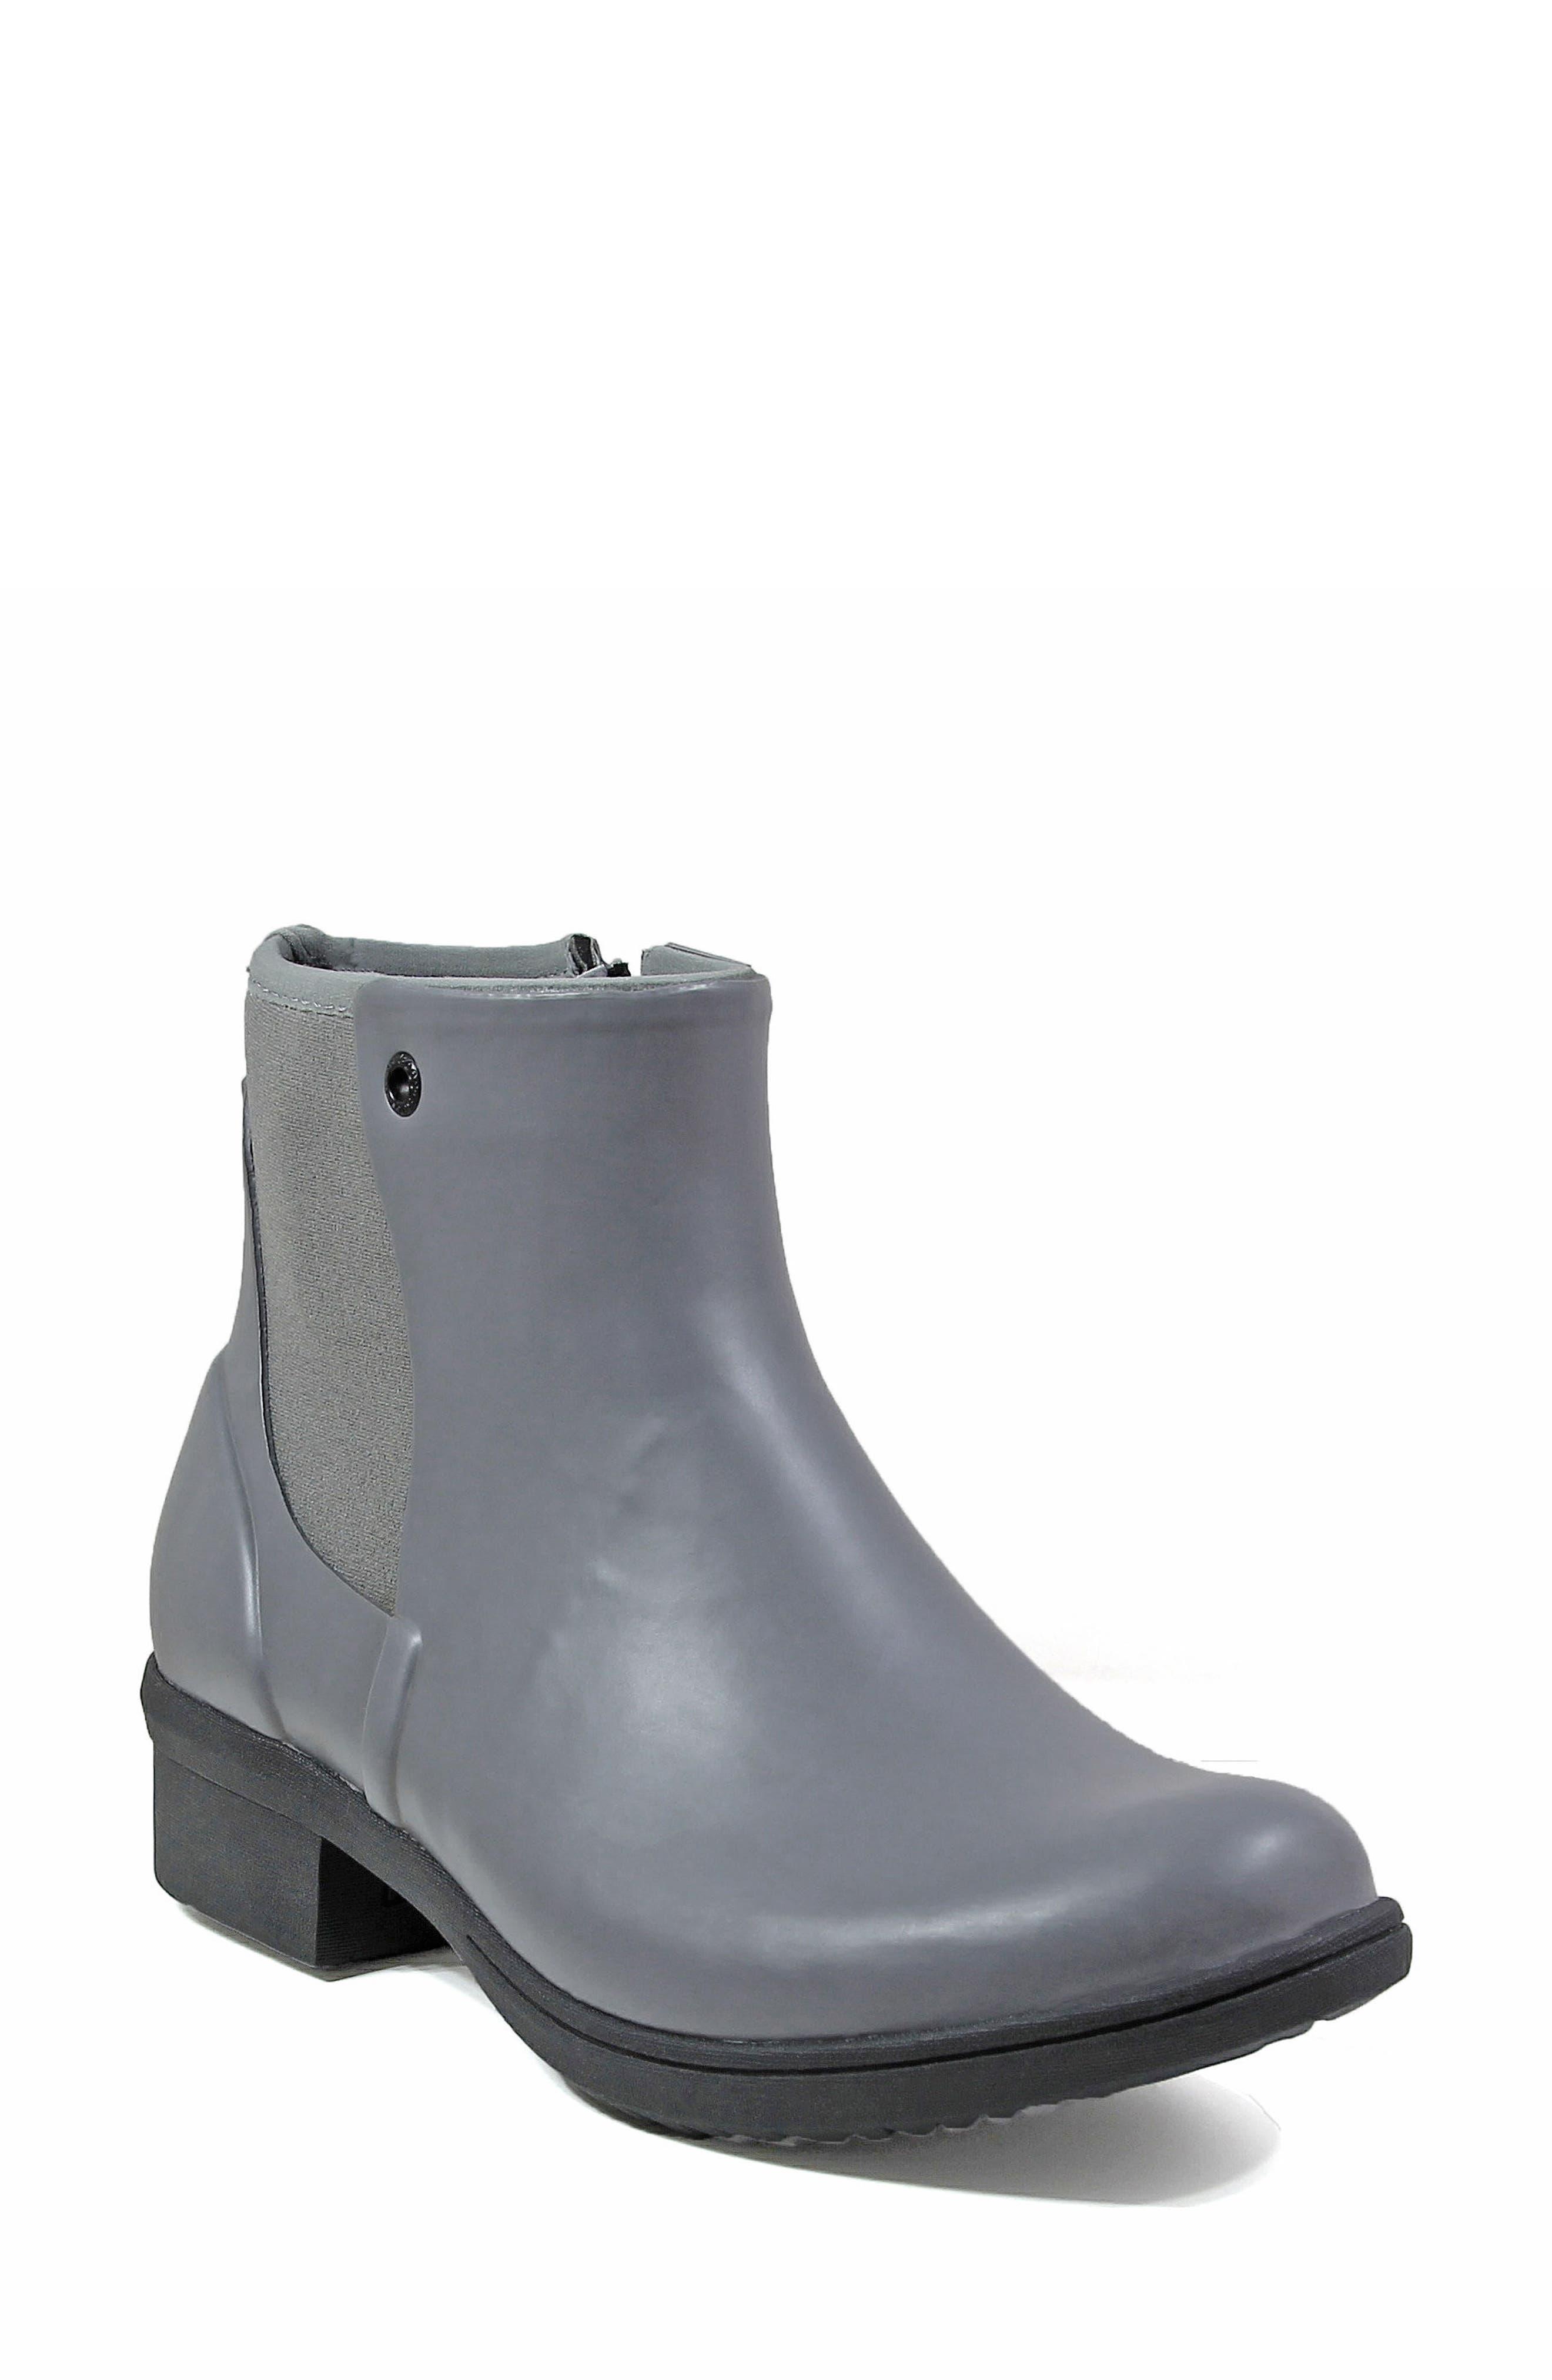 Main Image - BOGS Auburn Insulated Waterproof Boot (Women)